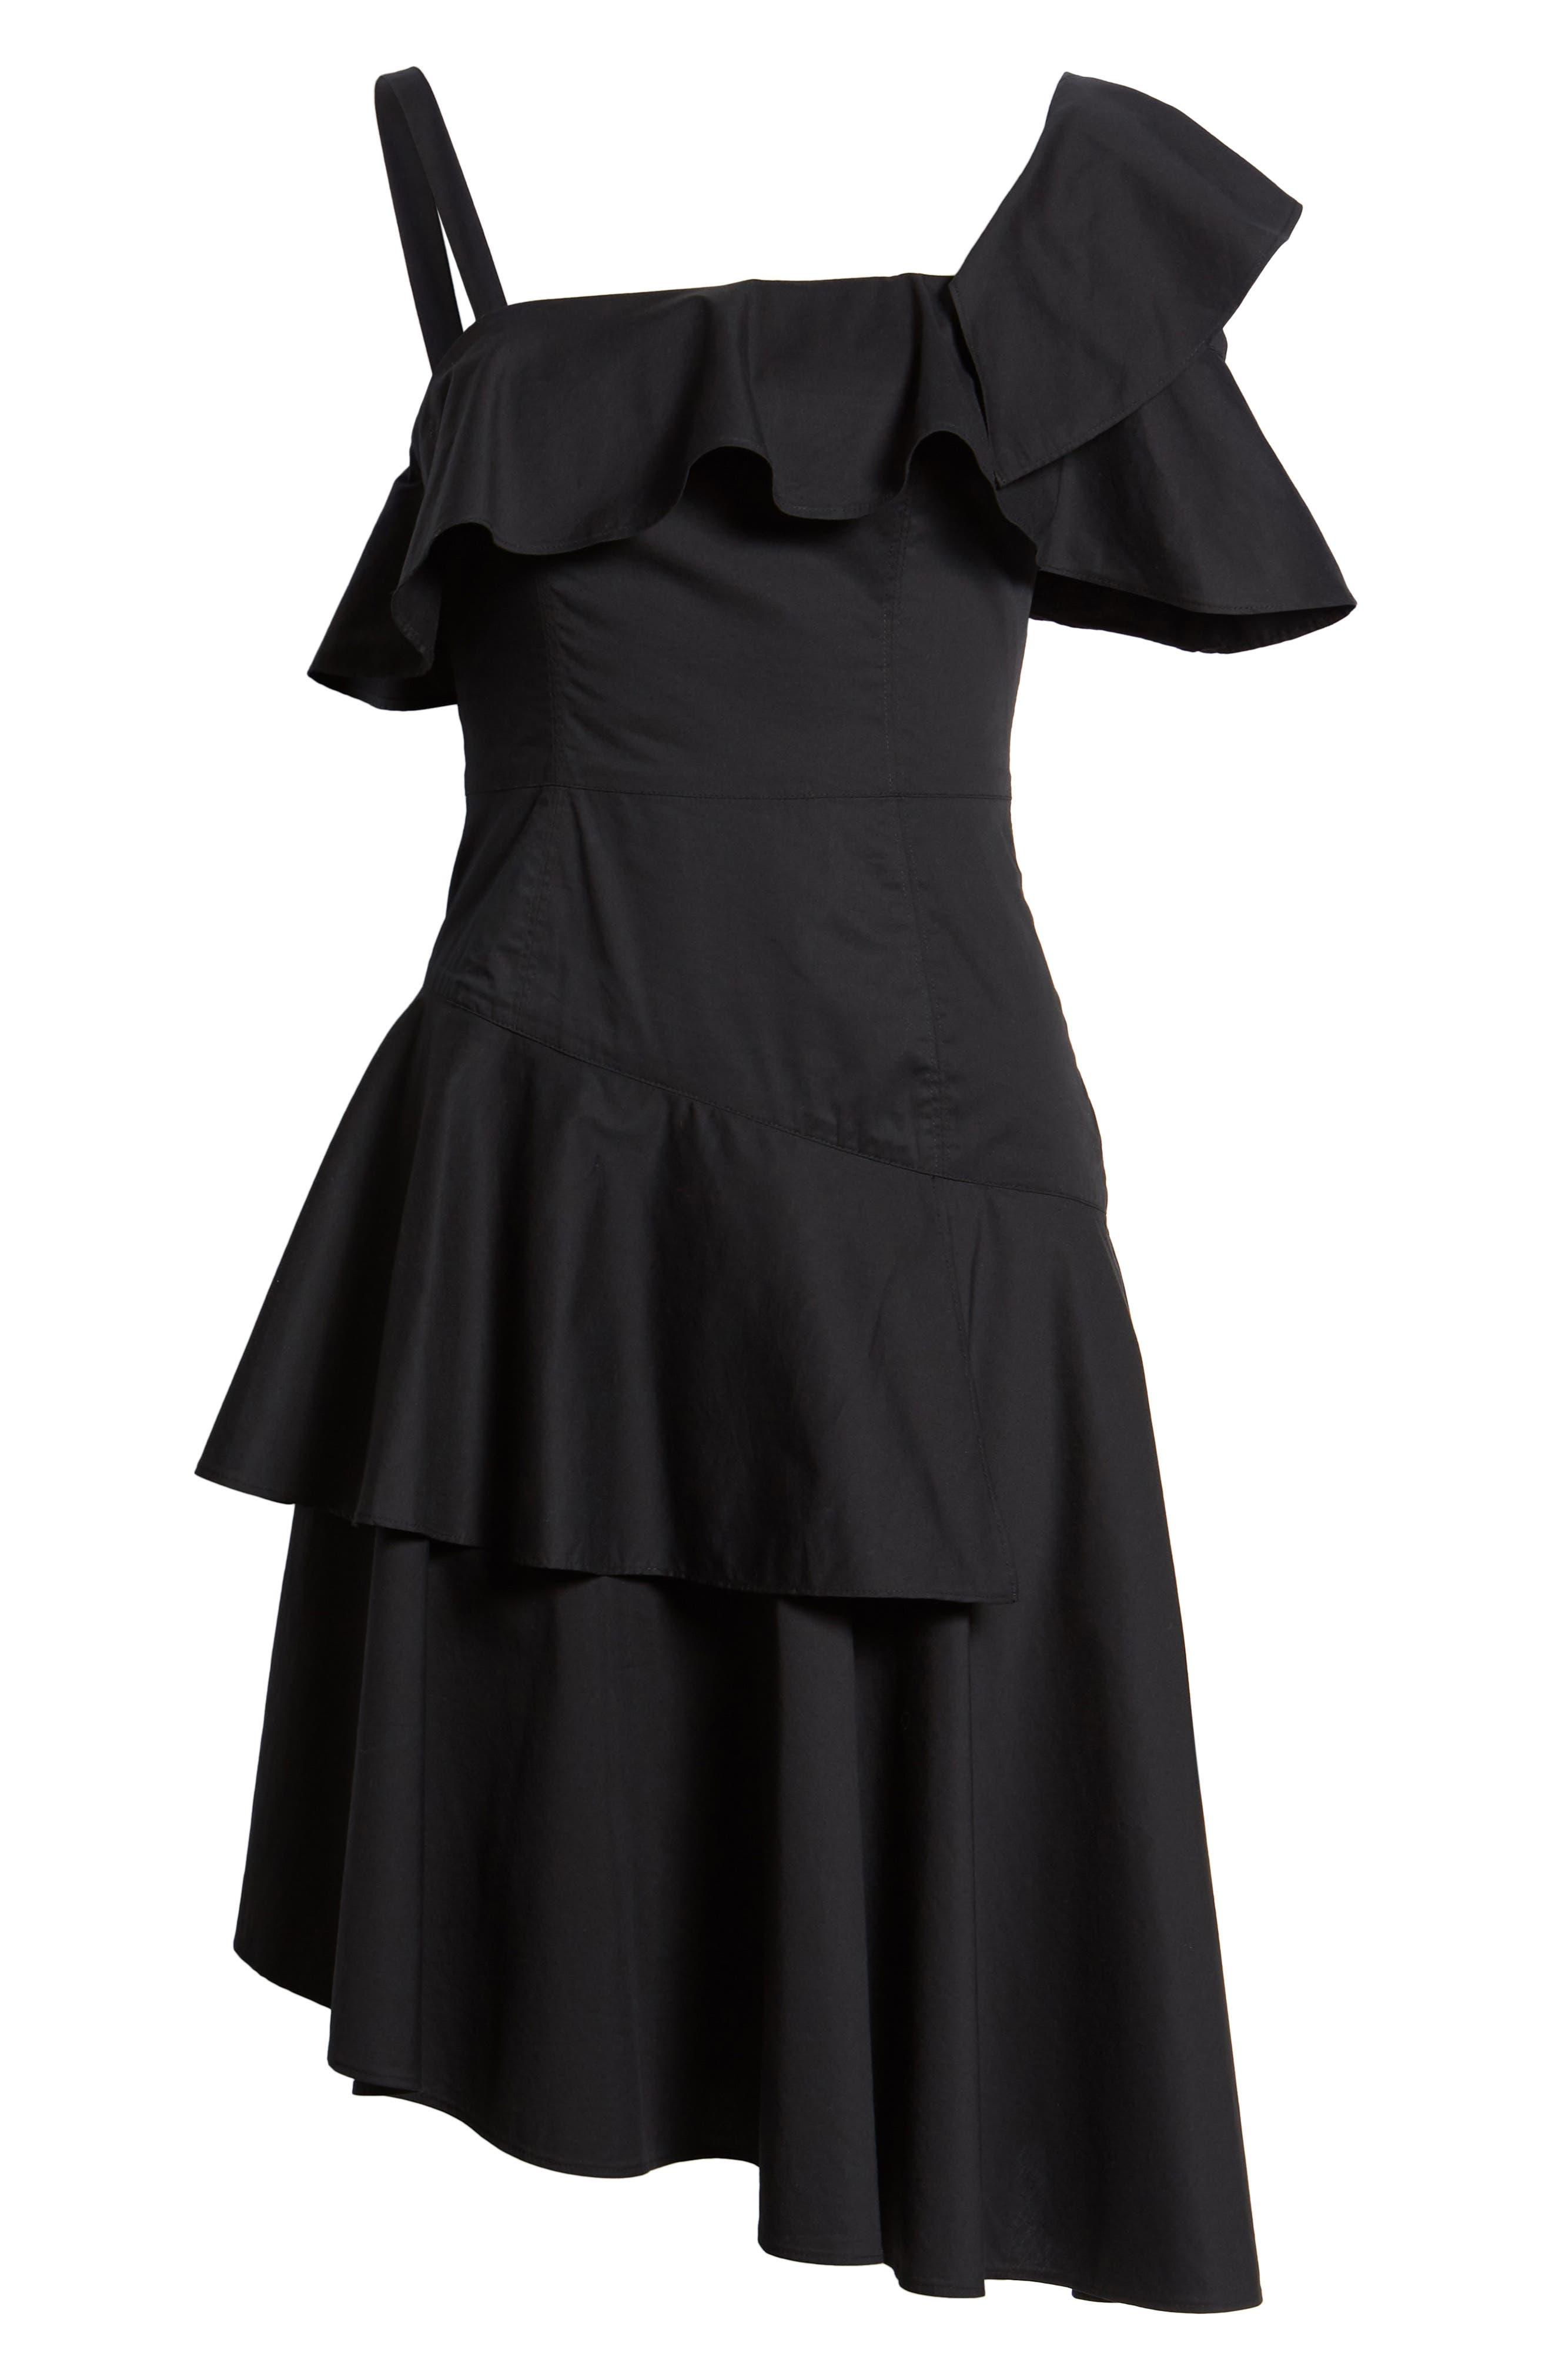 Ruffle One-Shoulder Dress,                             Alternate thumbnail 8, color,                             Black